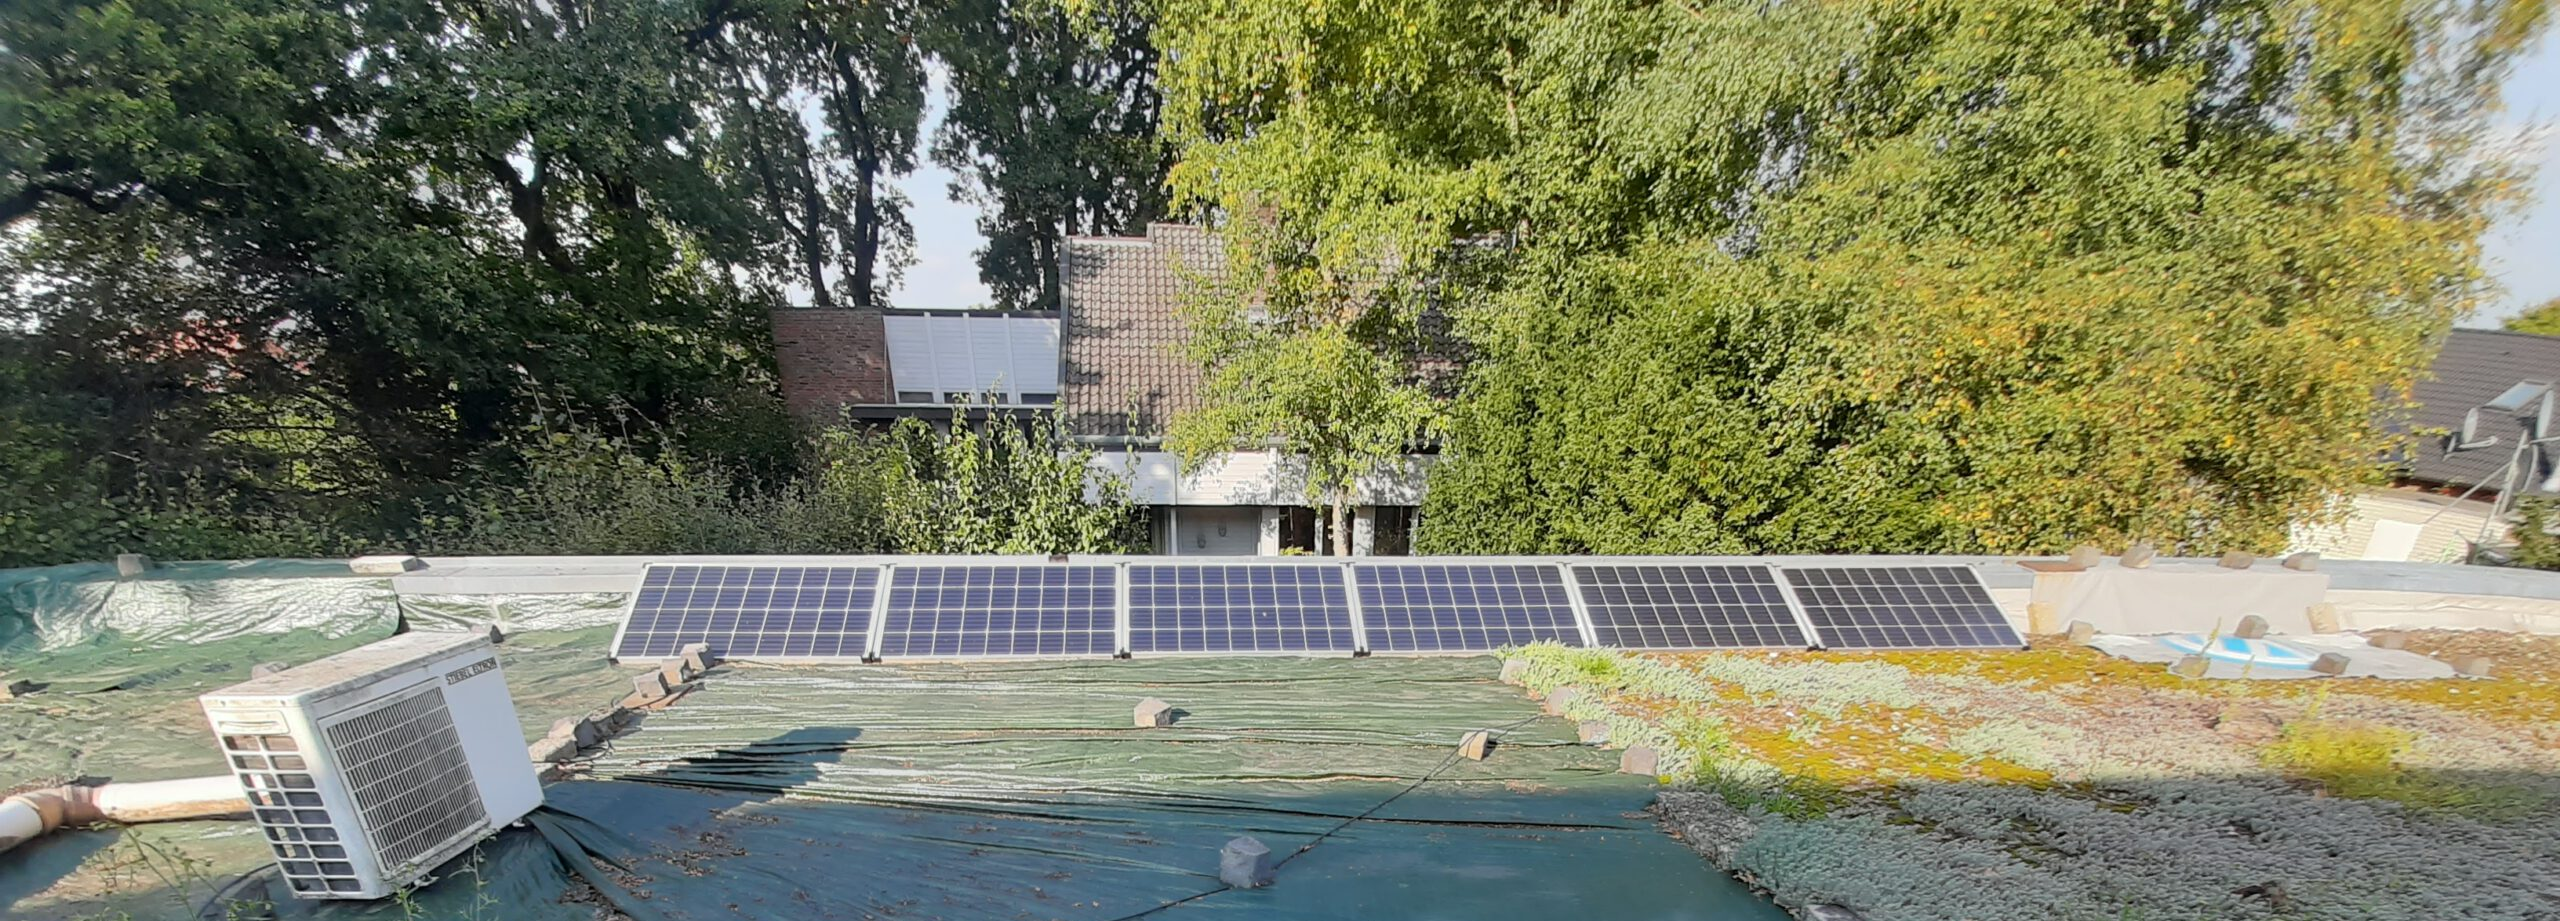 6 monokristalline Solarzellen